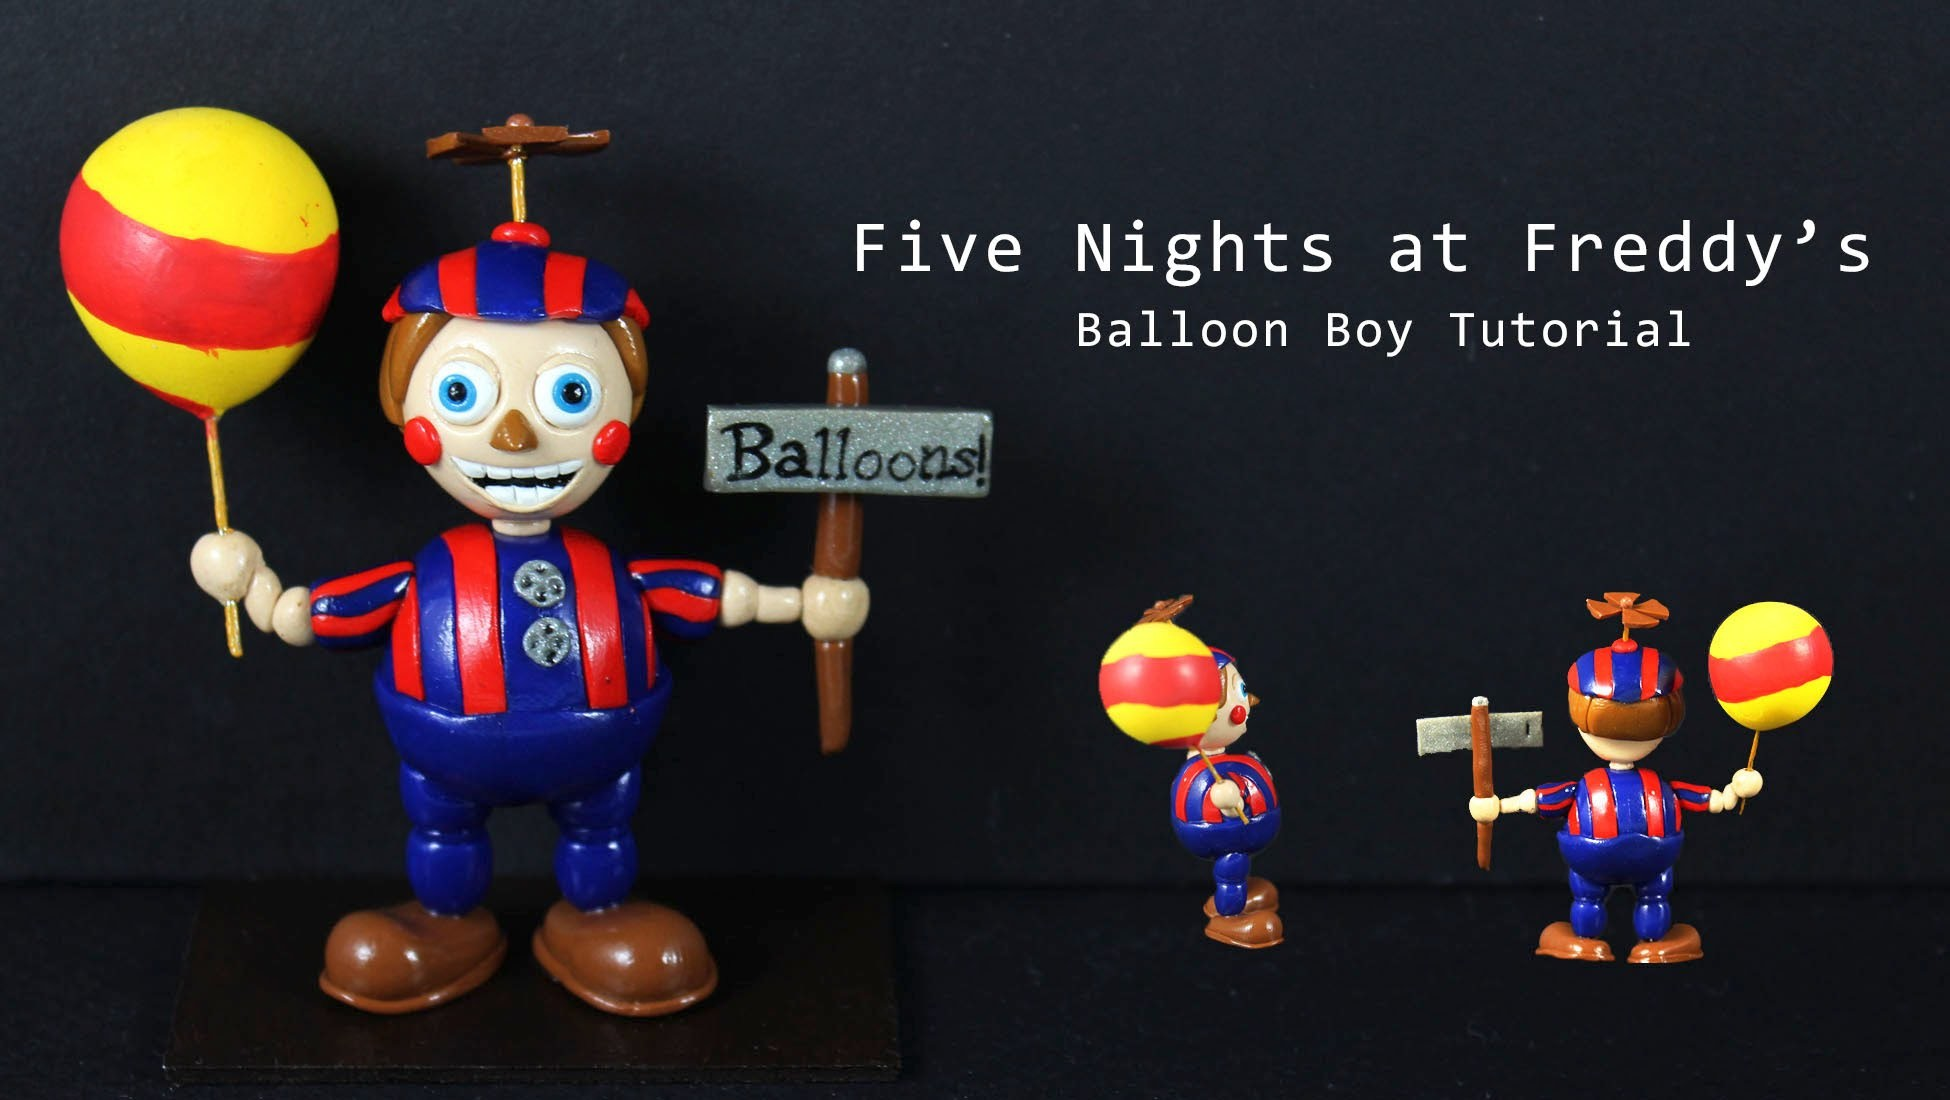 Five Nights at Freddy's 2 Balloon Boy Polymer Clay Tutorial